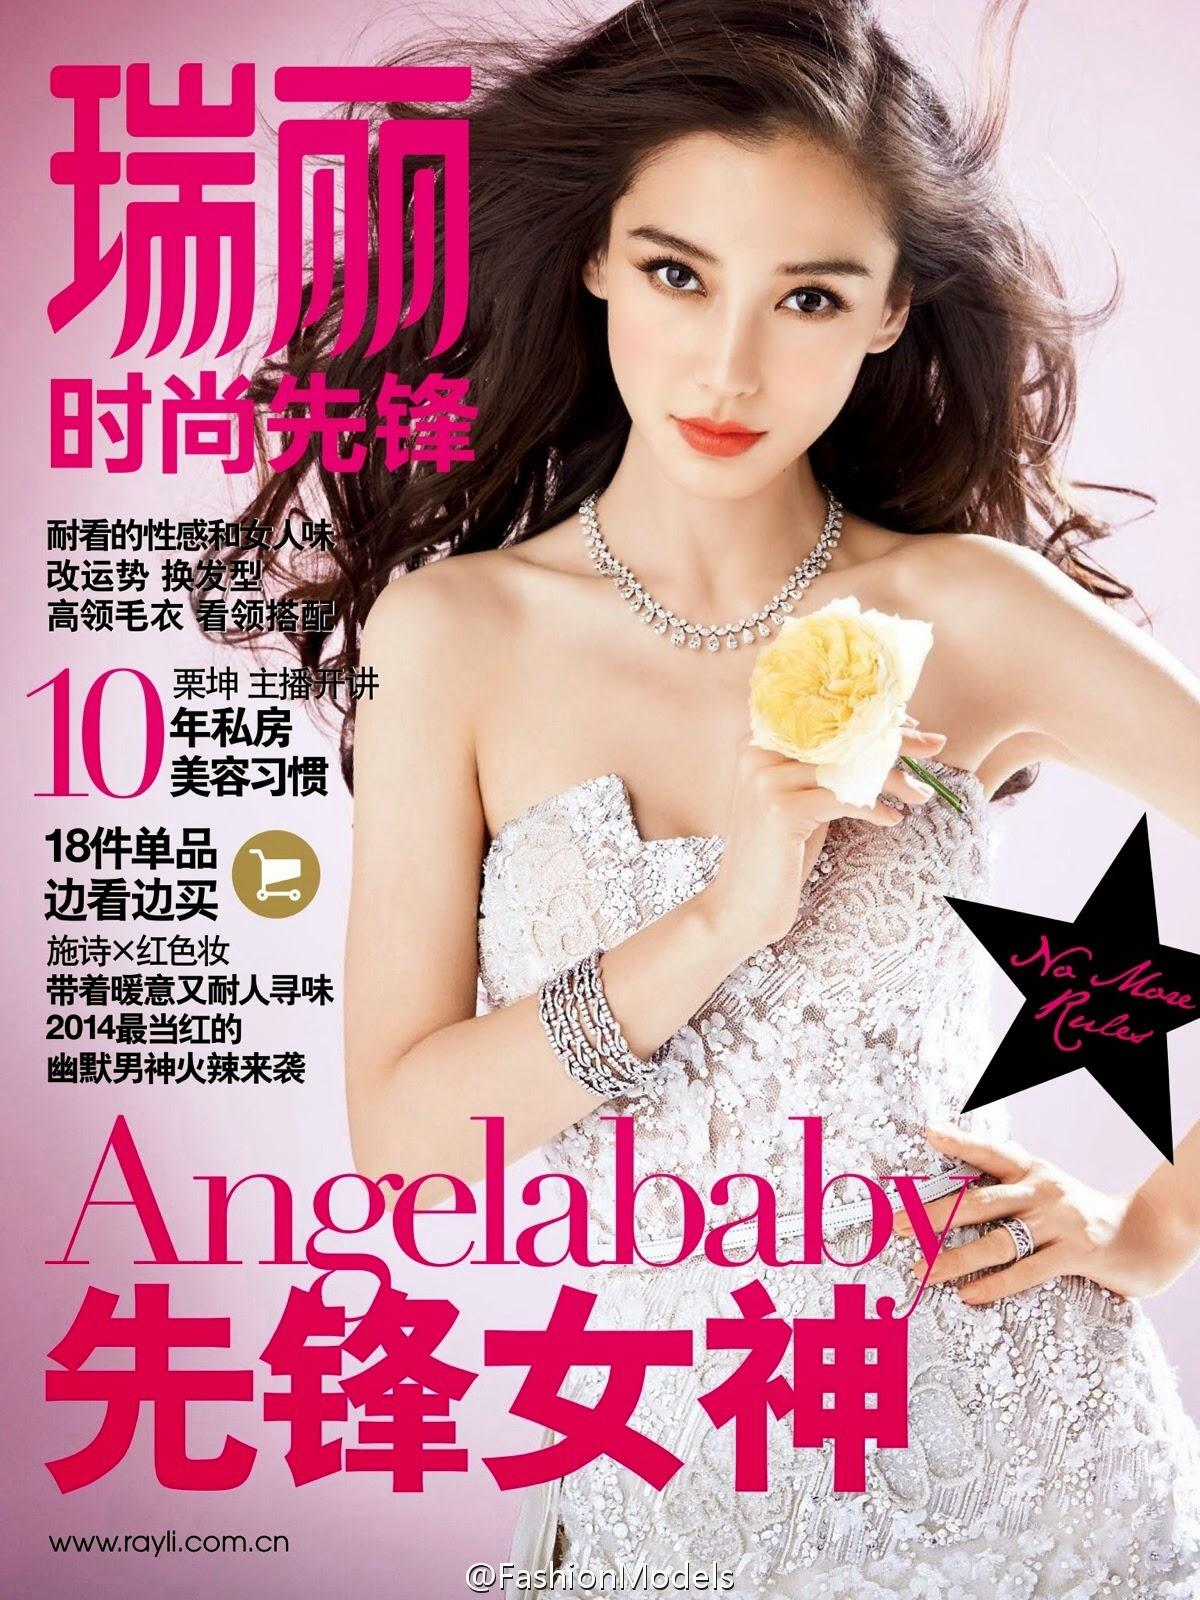 Angelababy -  Rayli 瑞丽 Glamorous Dress